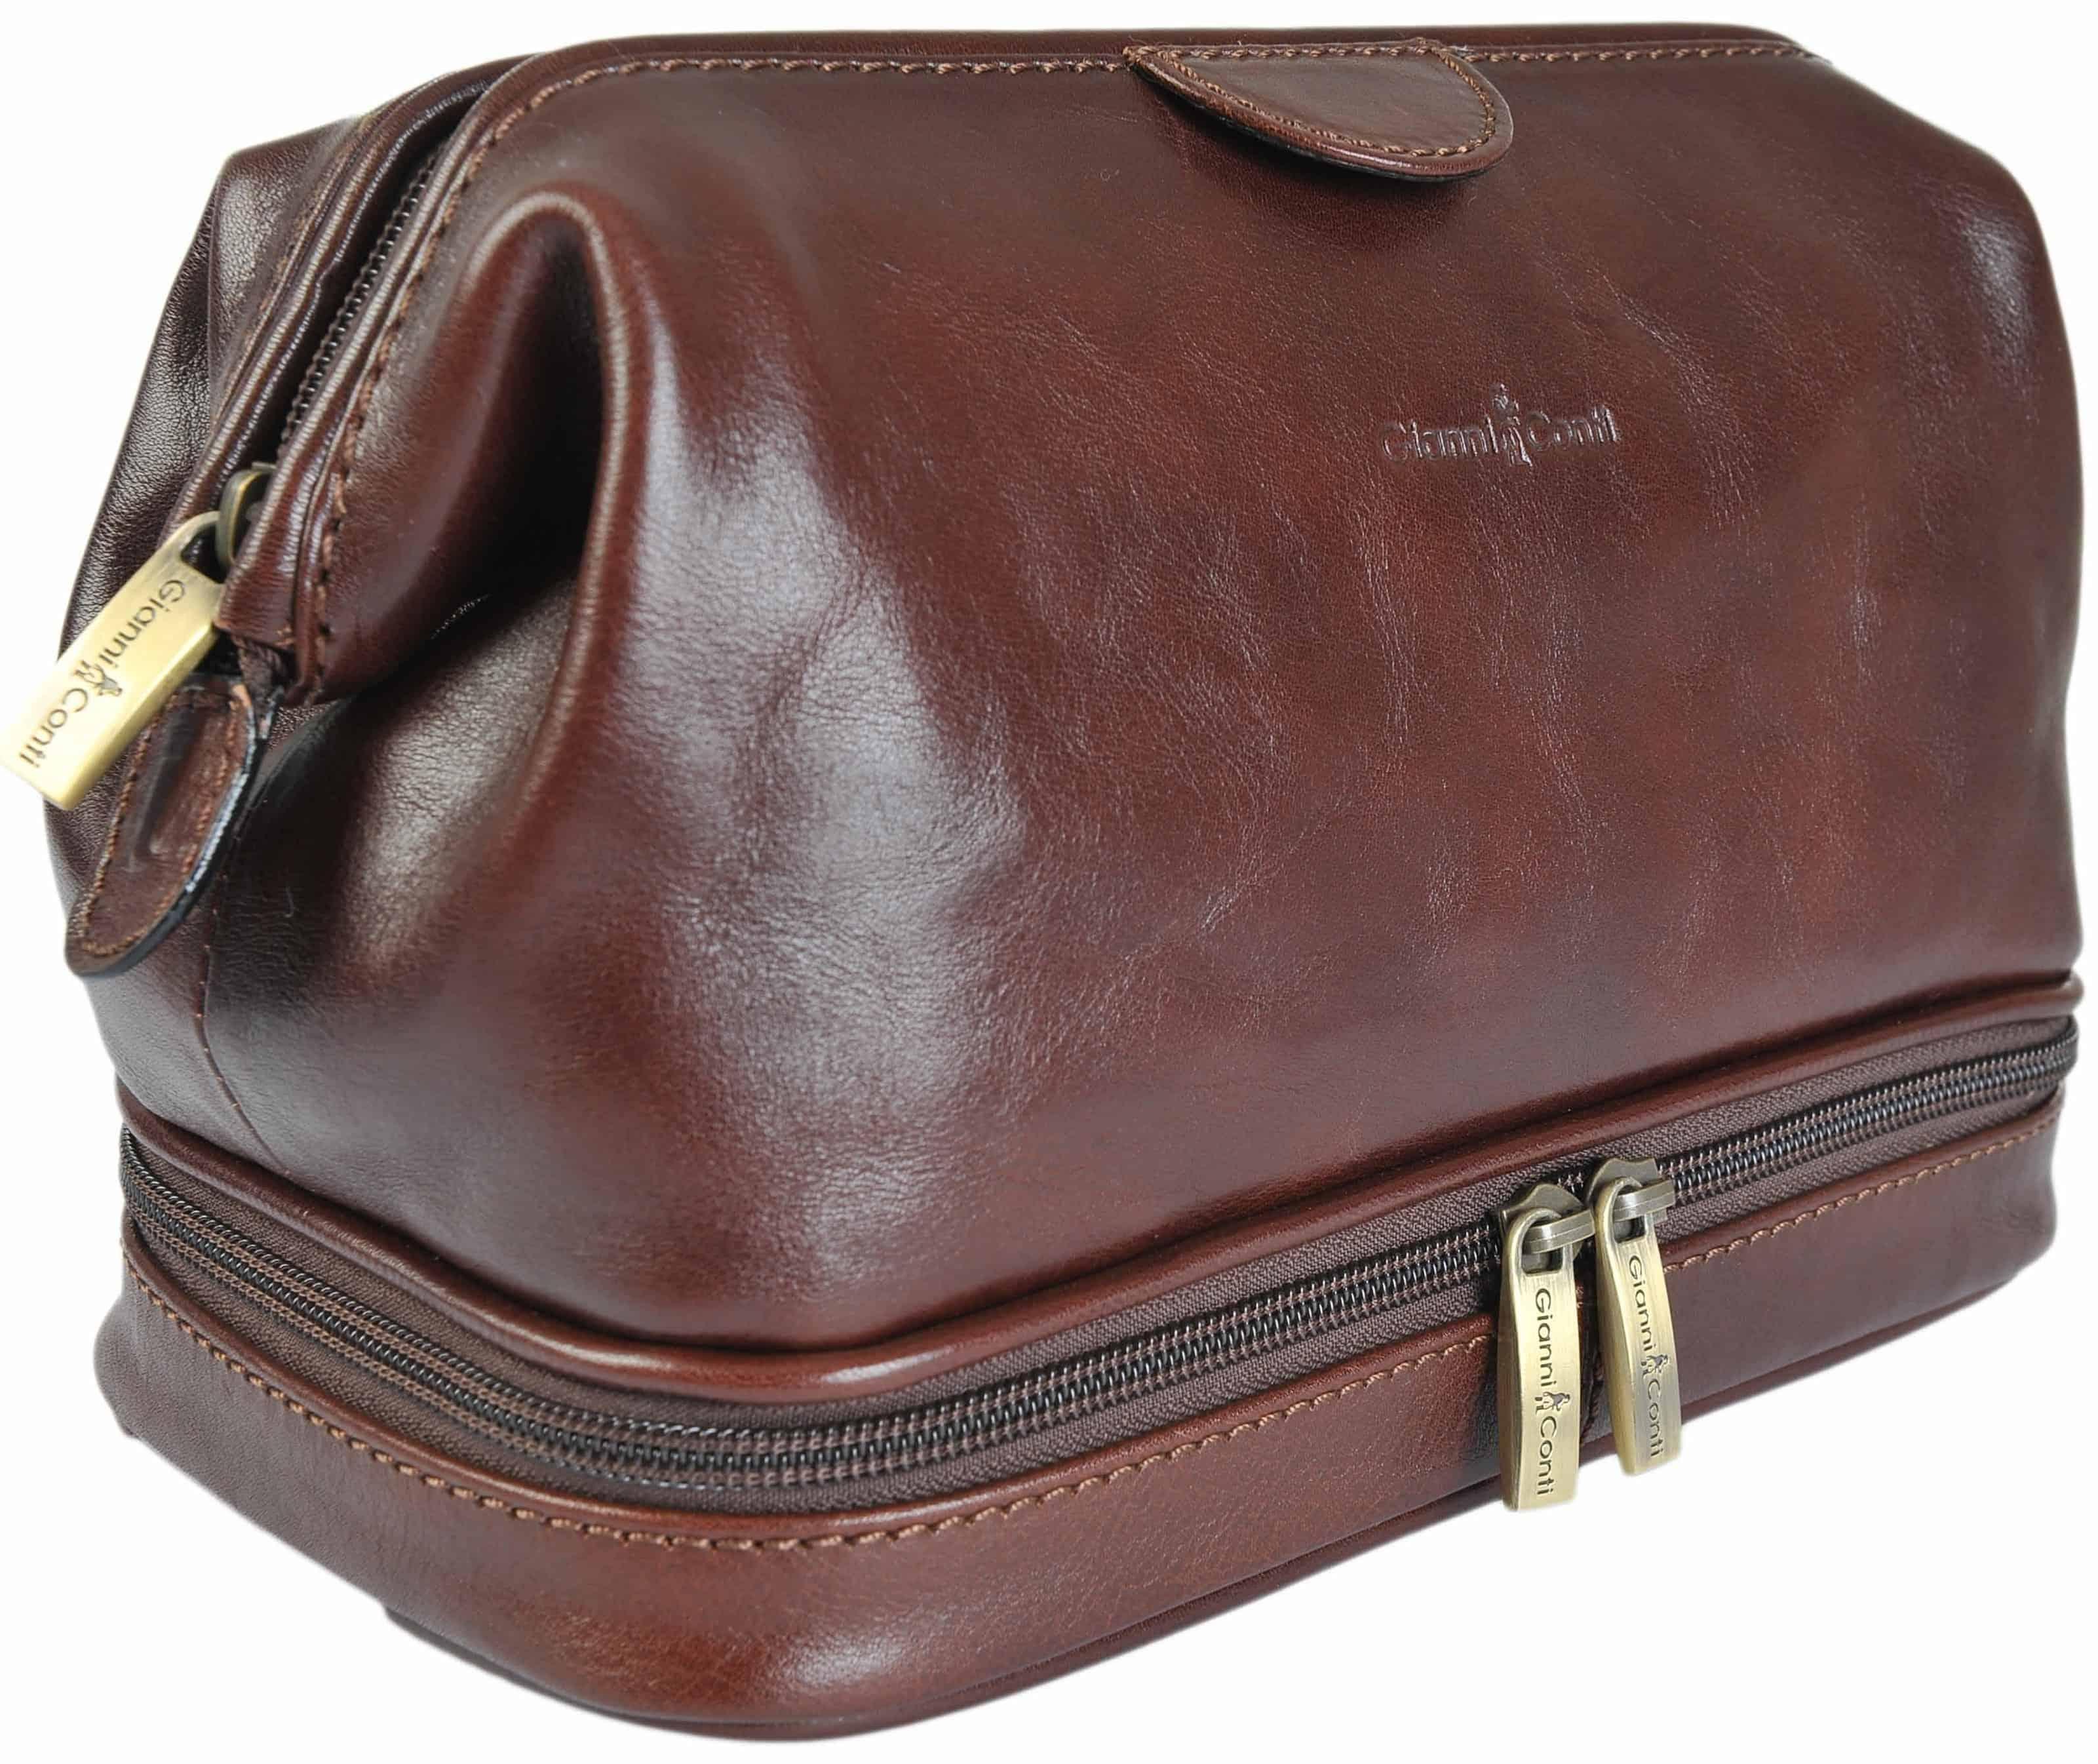 e178dc173d Gianni Conti Fine Italian Leather Brown Frame Travel Wash Toiletry Bag  905011